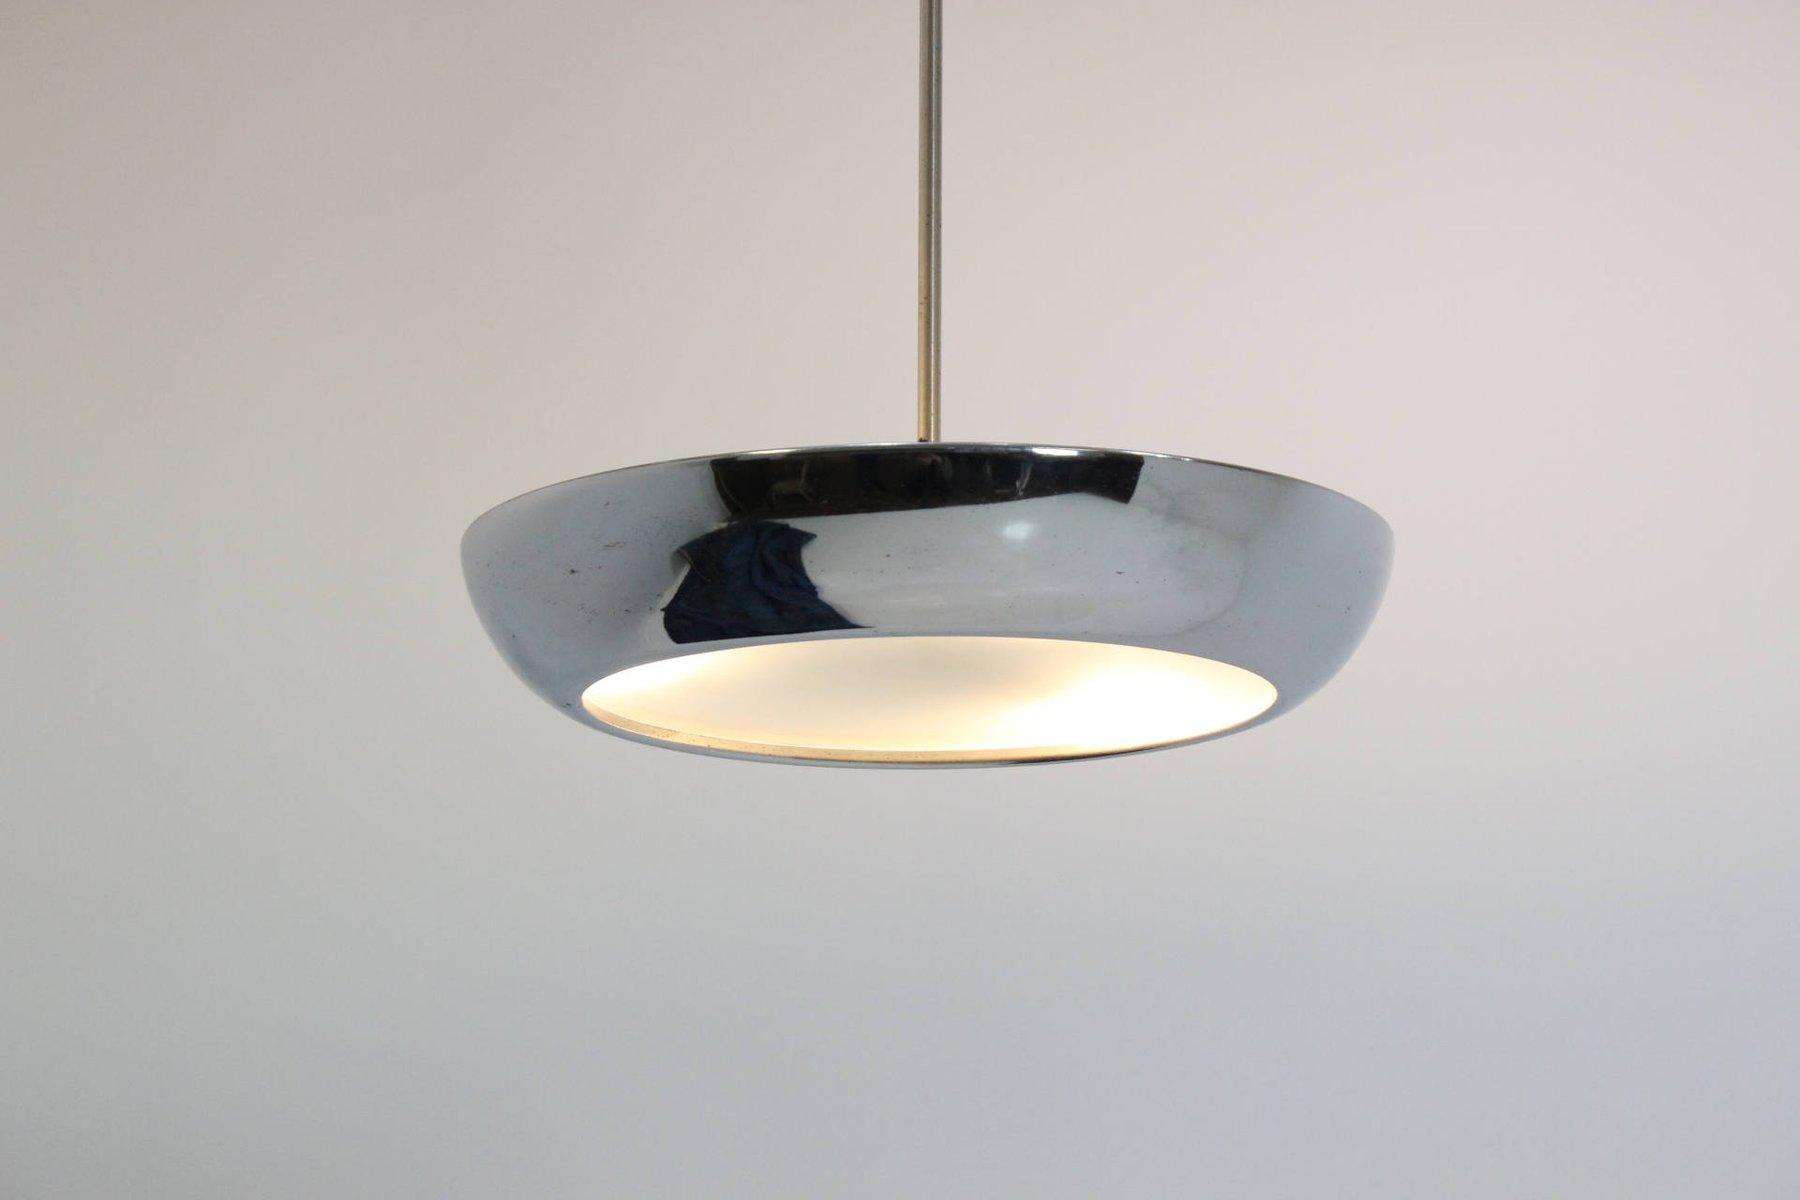 deco art bukobject ceiling light an the first century bukowskis fullsize of half lamp ceilings en lots